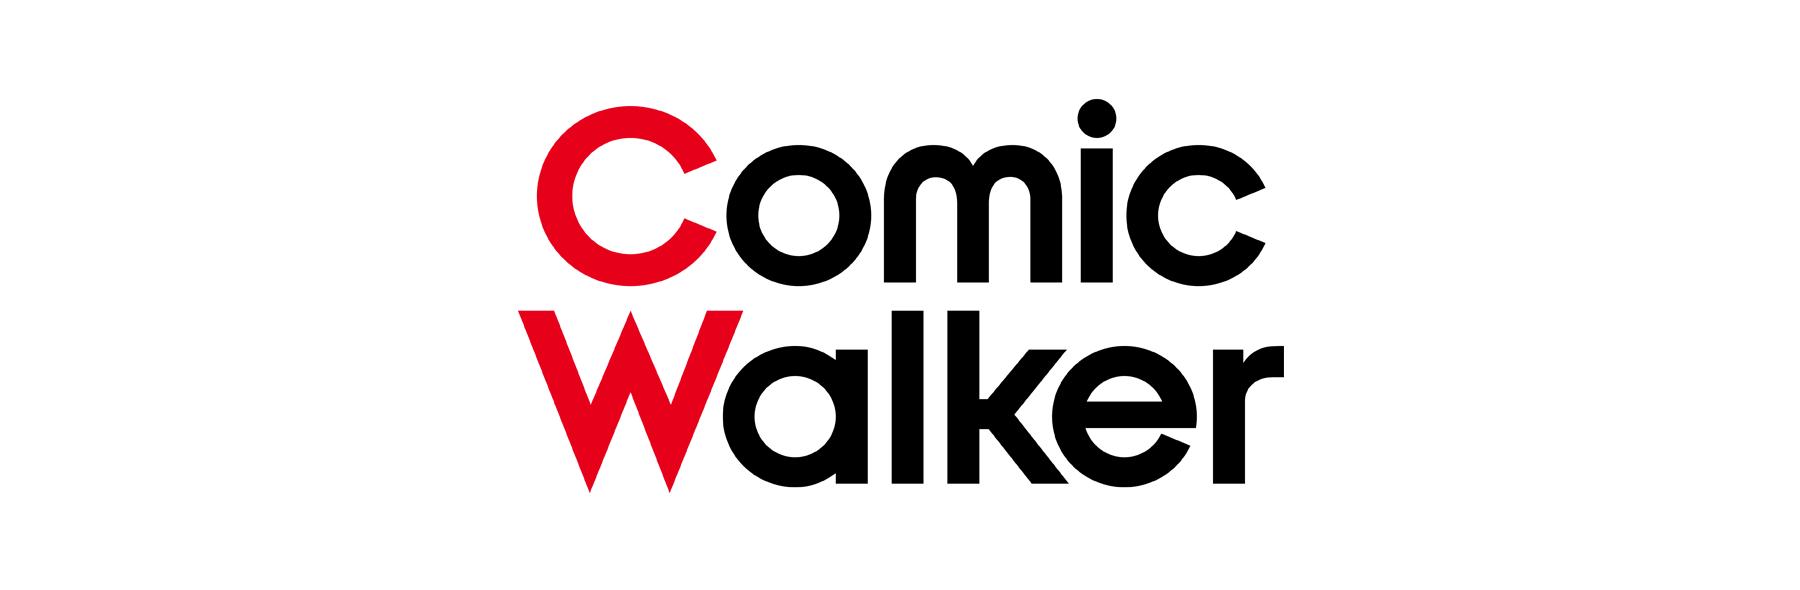 Comic walker - 20+ Best Free Online Manga Websites 2021